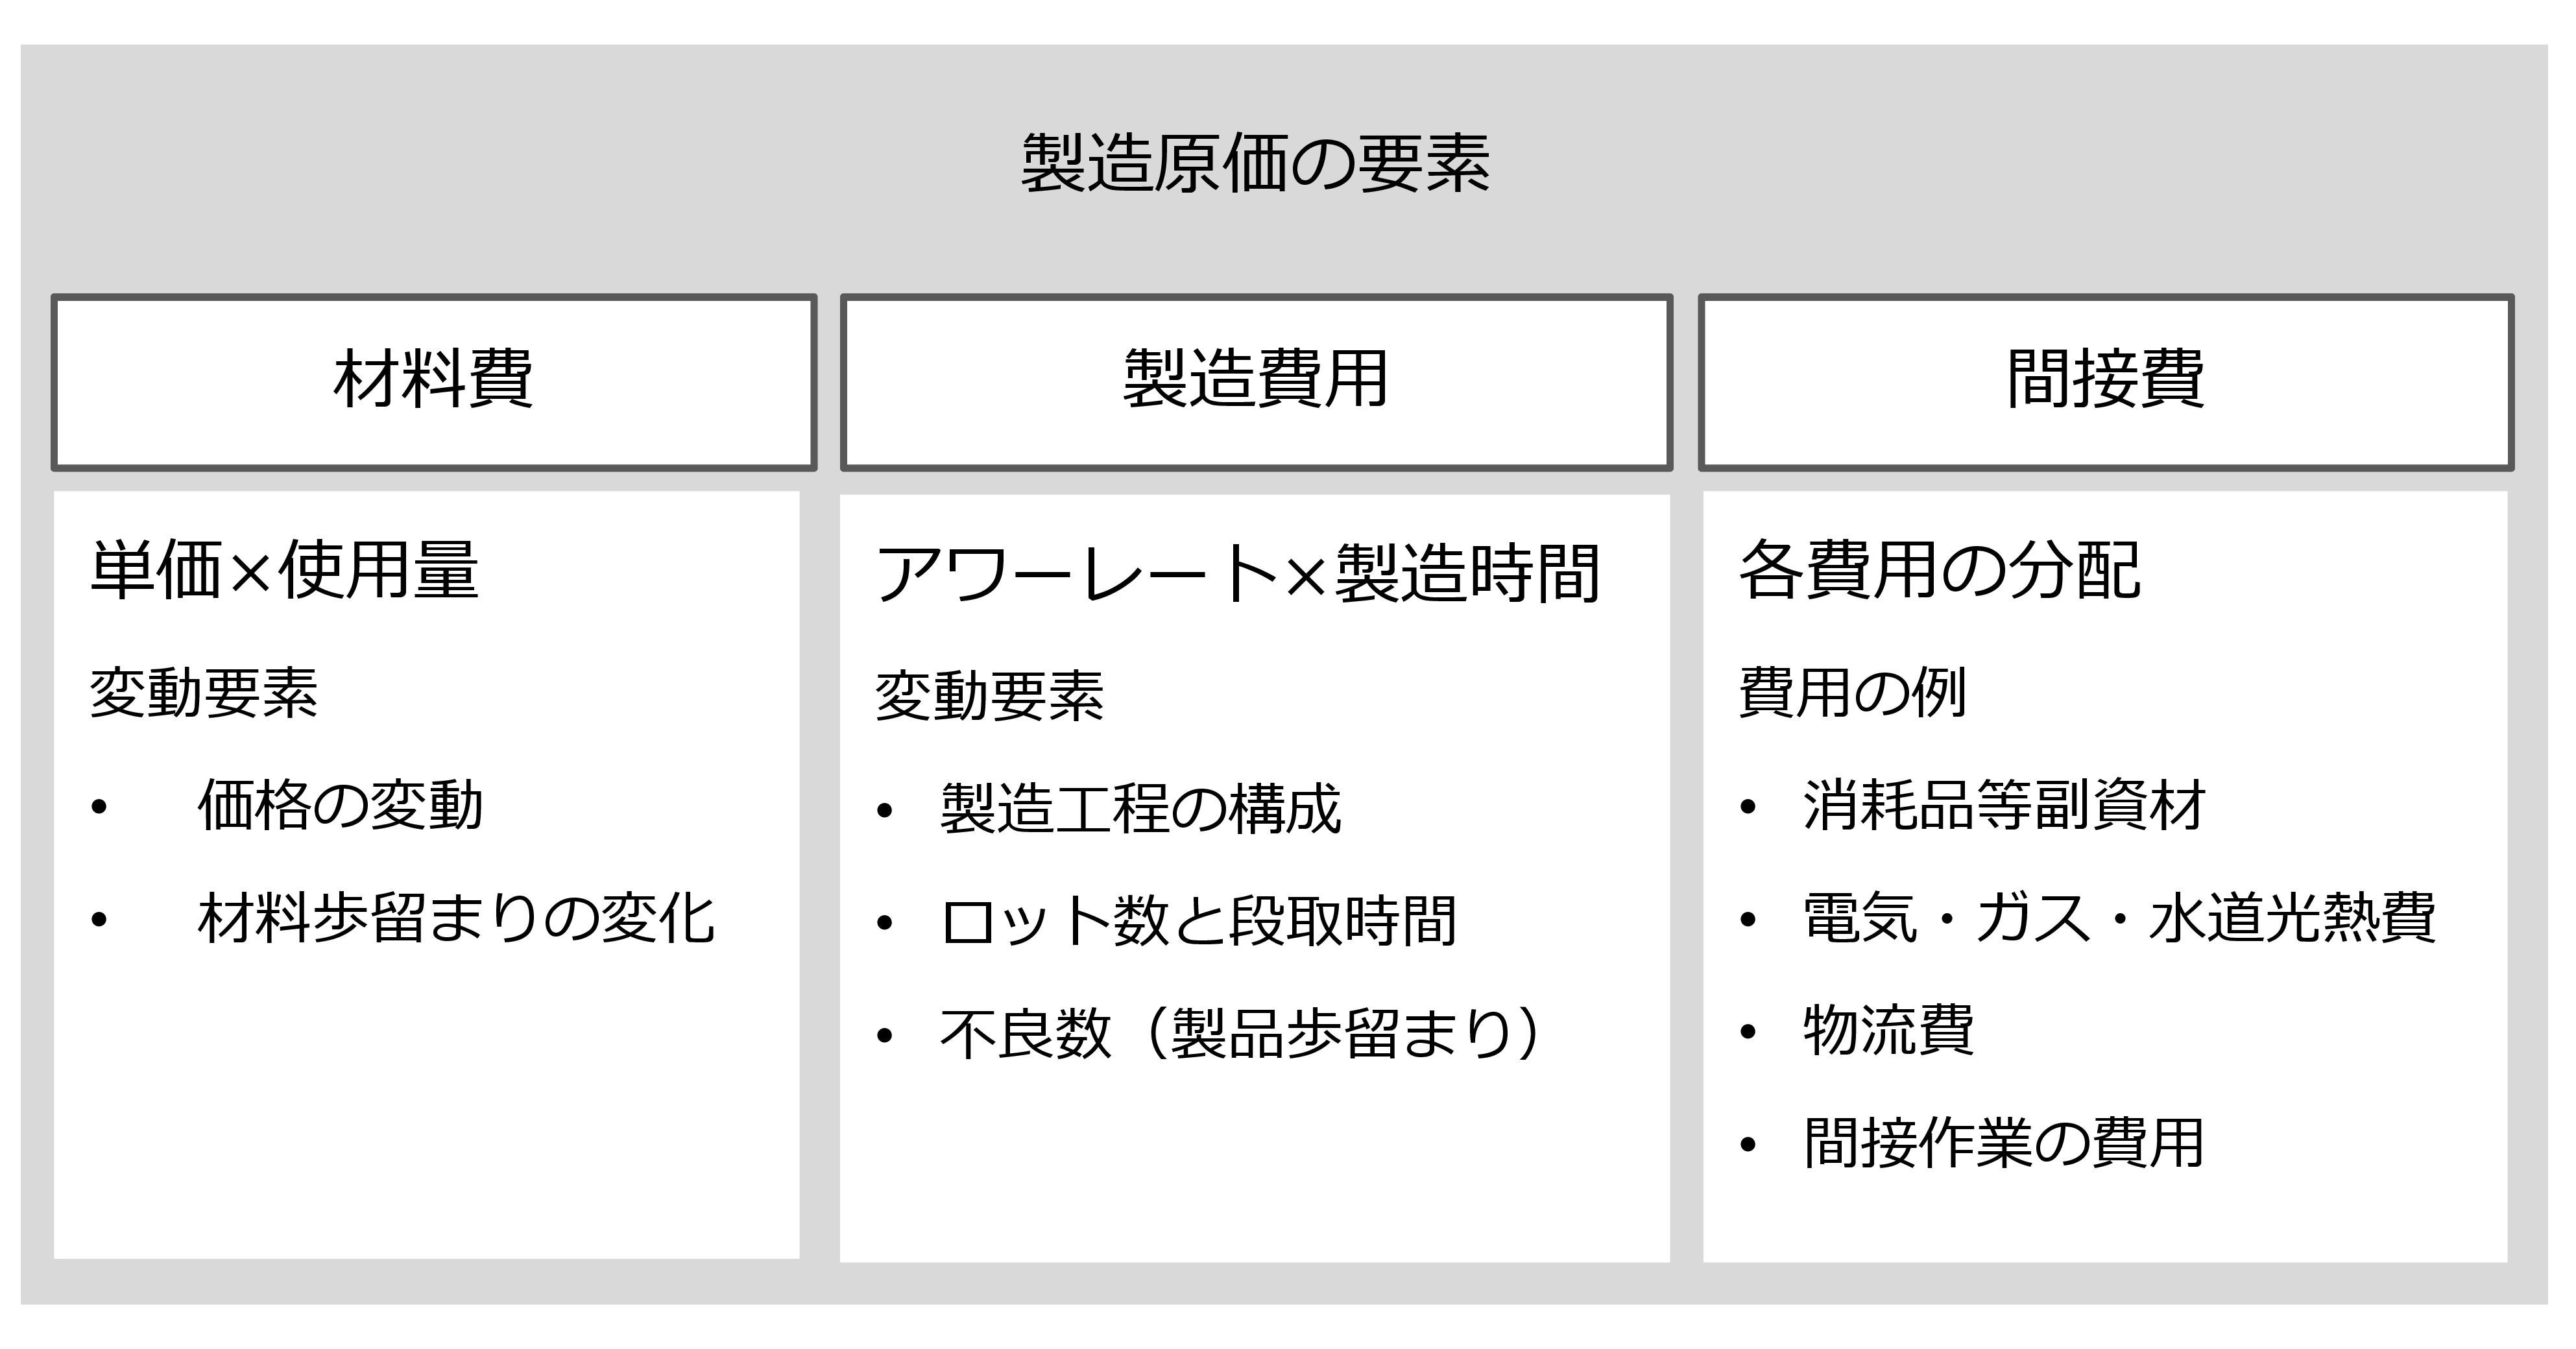 図1-1 製造原価の構成